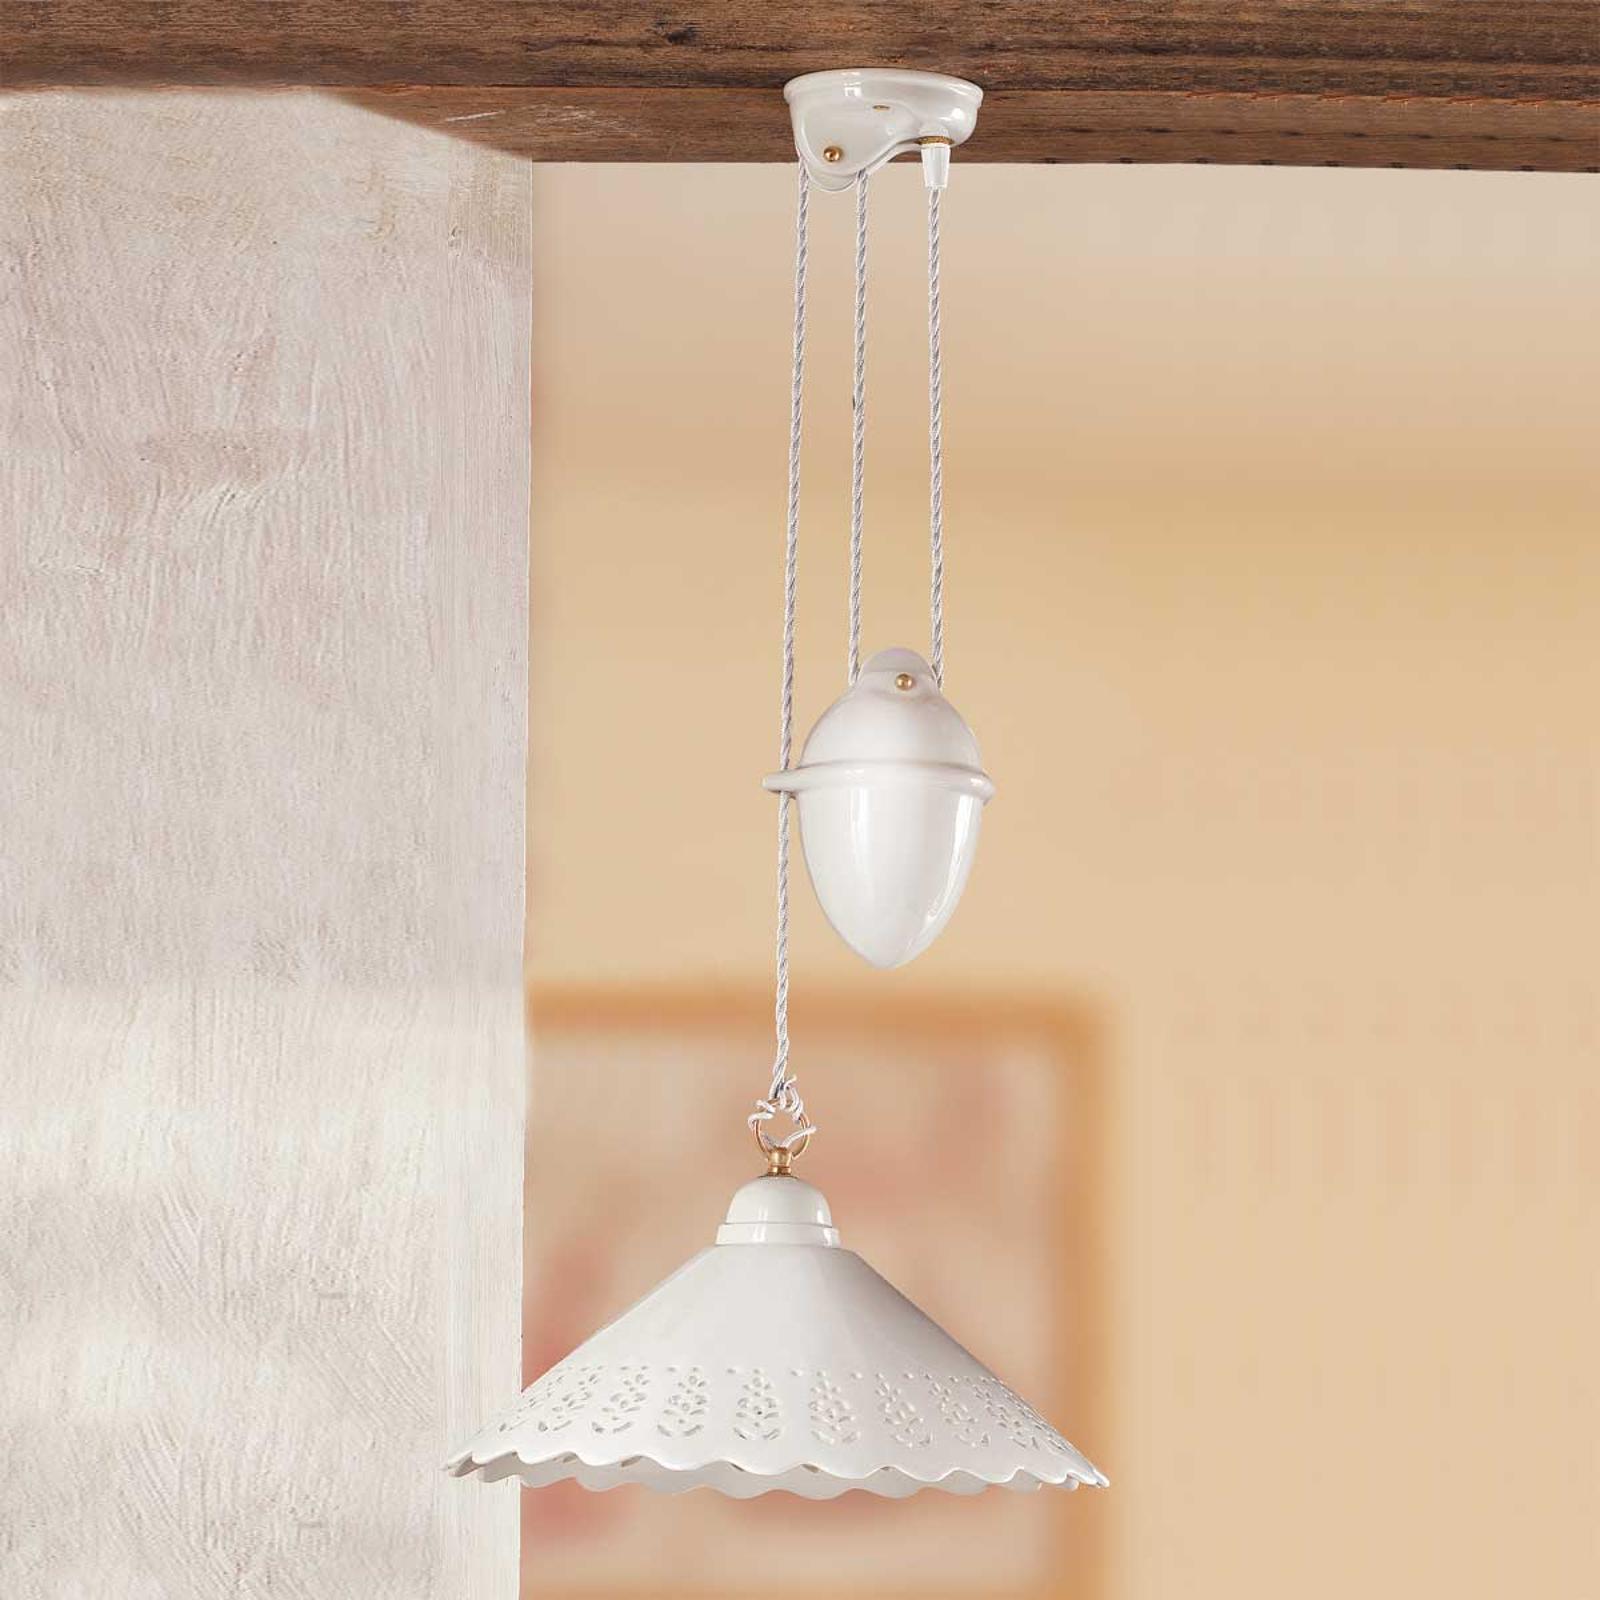 Hänglampa Pizzo med dragpendel, 1 lampa, 40 cm